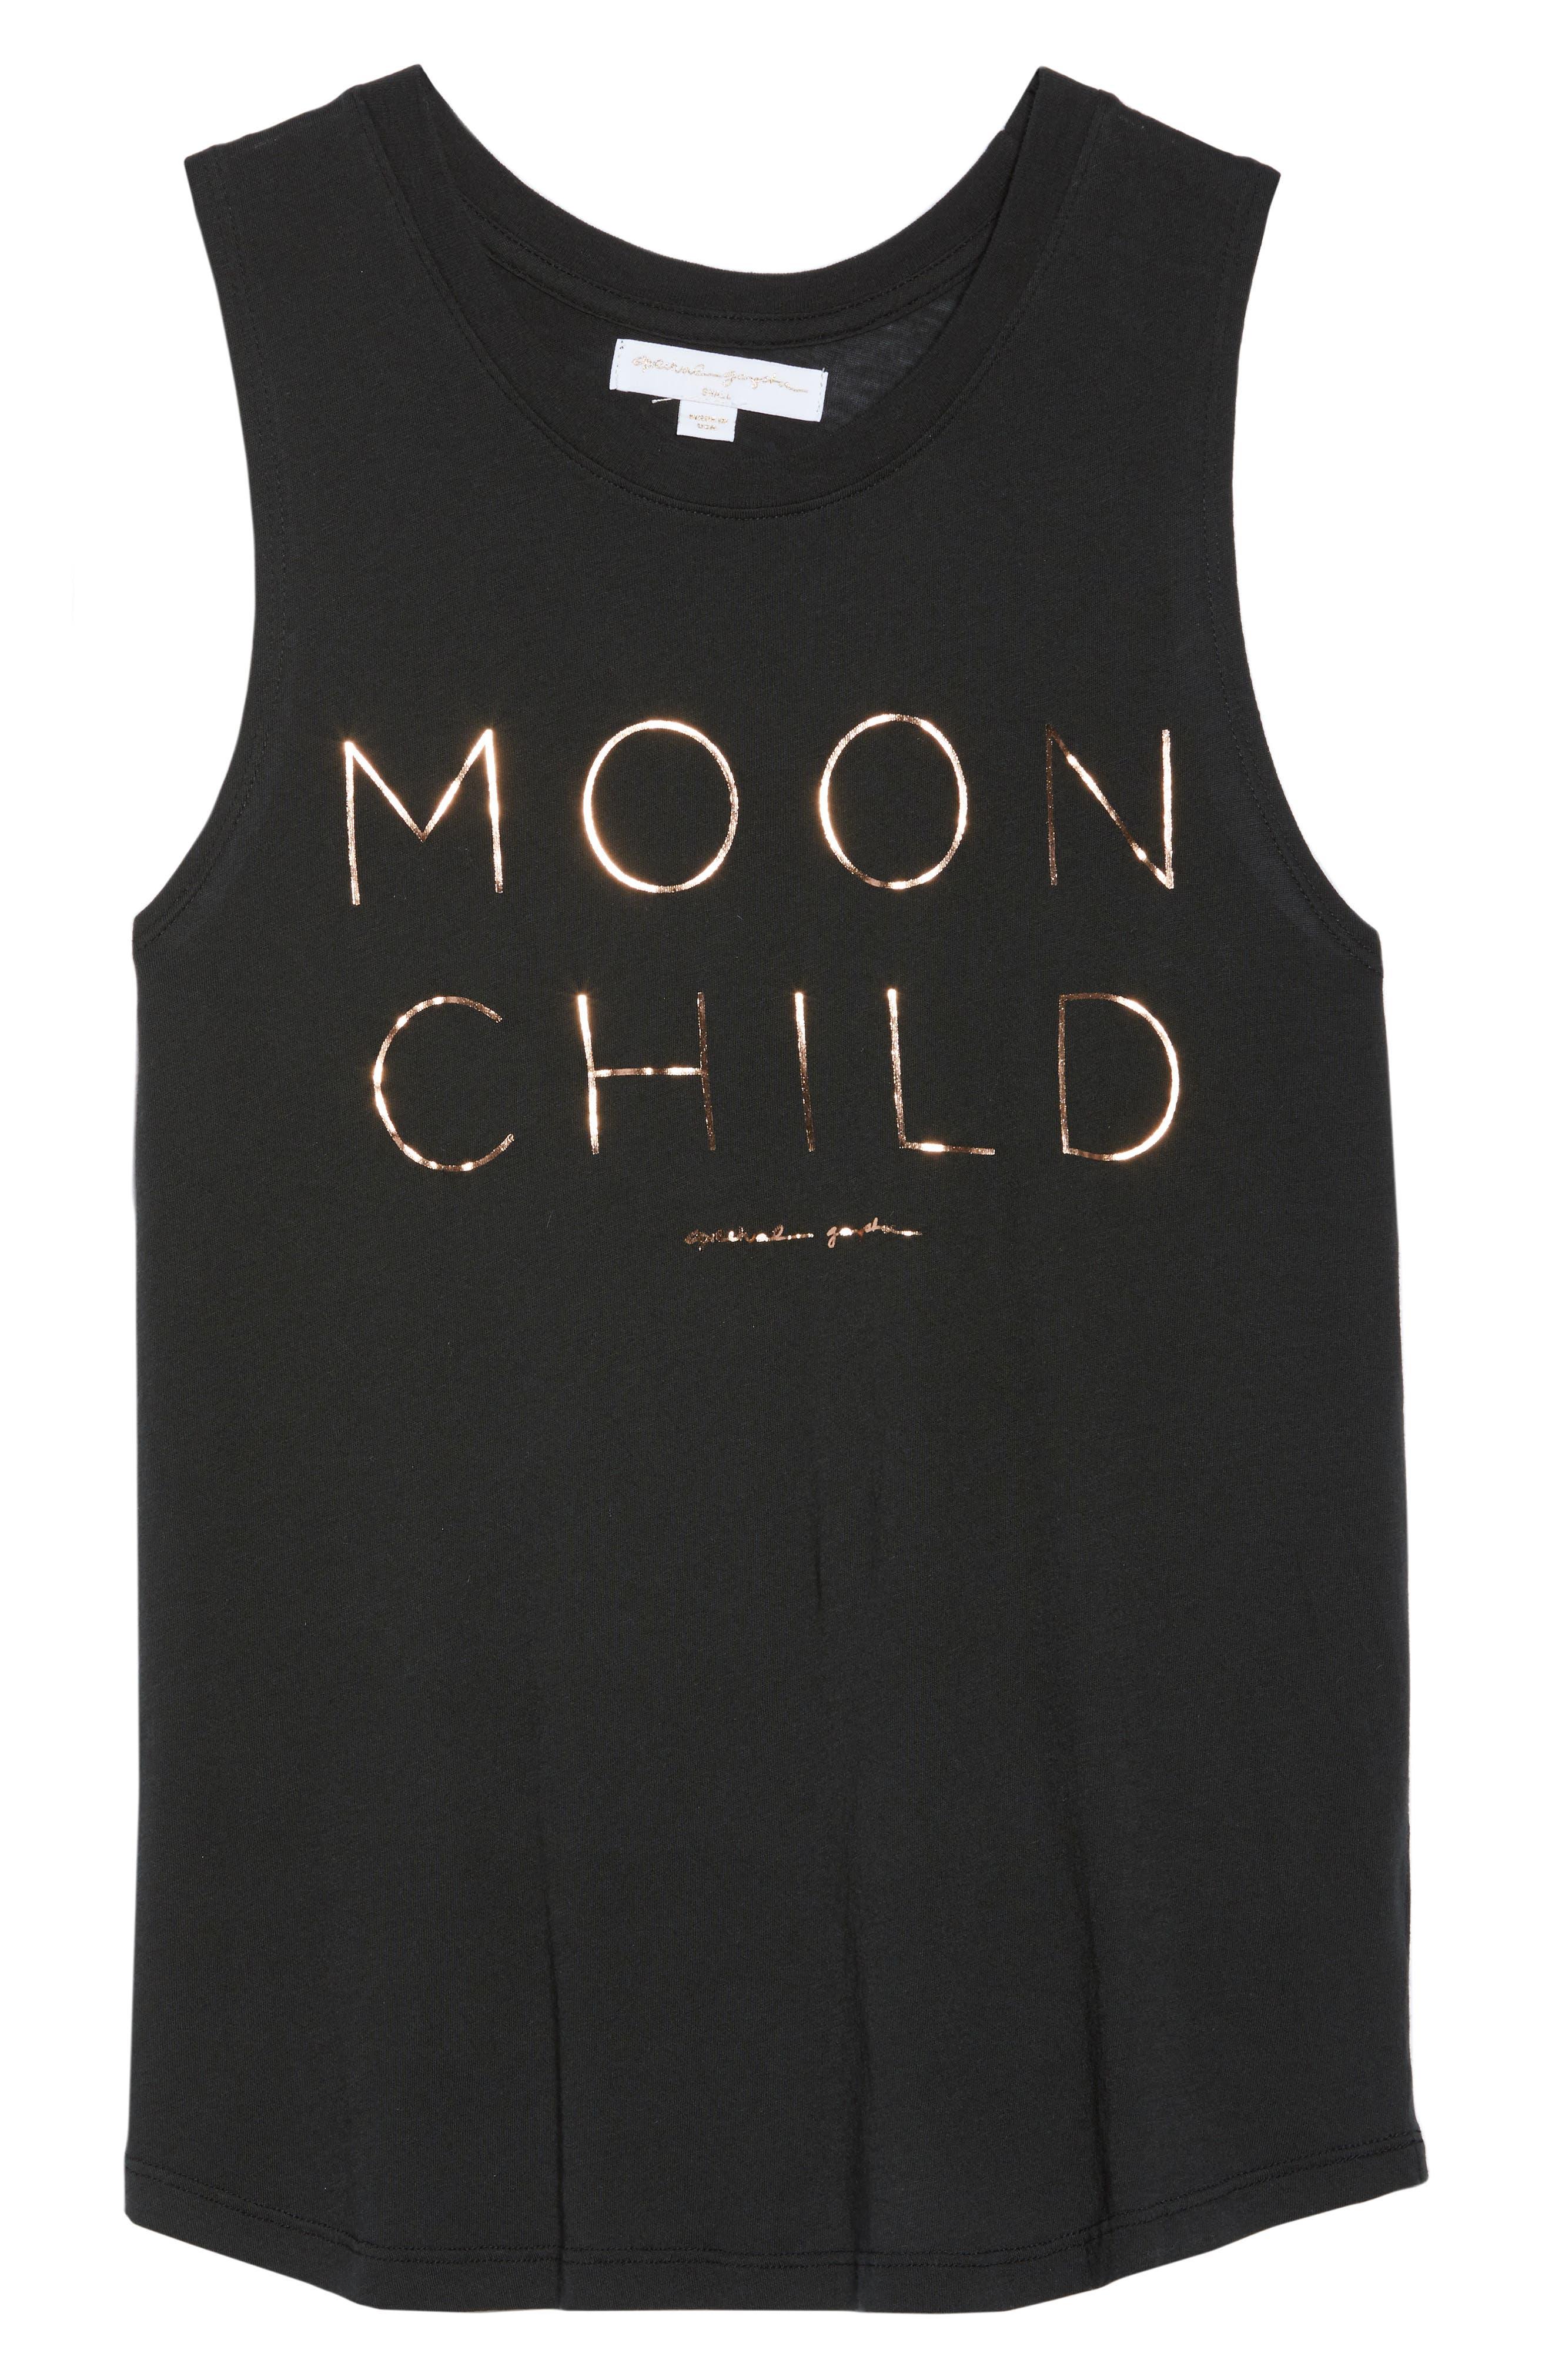 Moon Child Tank,                             Alternate thumbnail 7, color,                             003